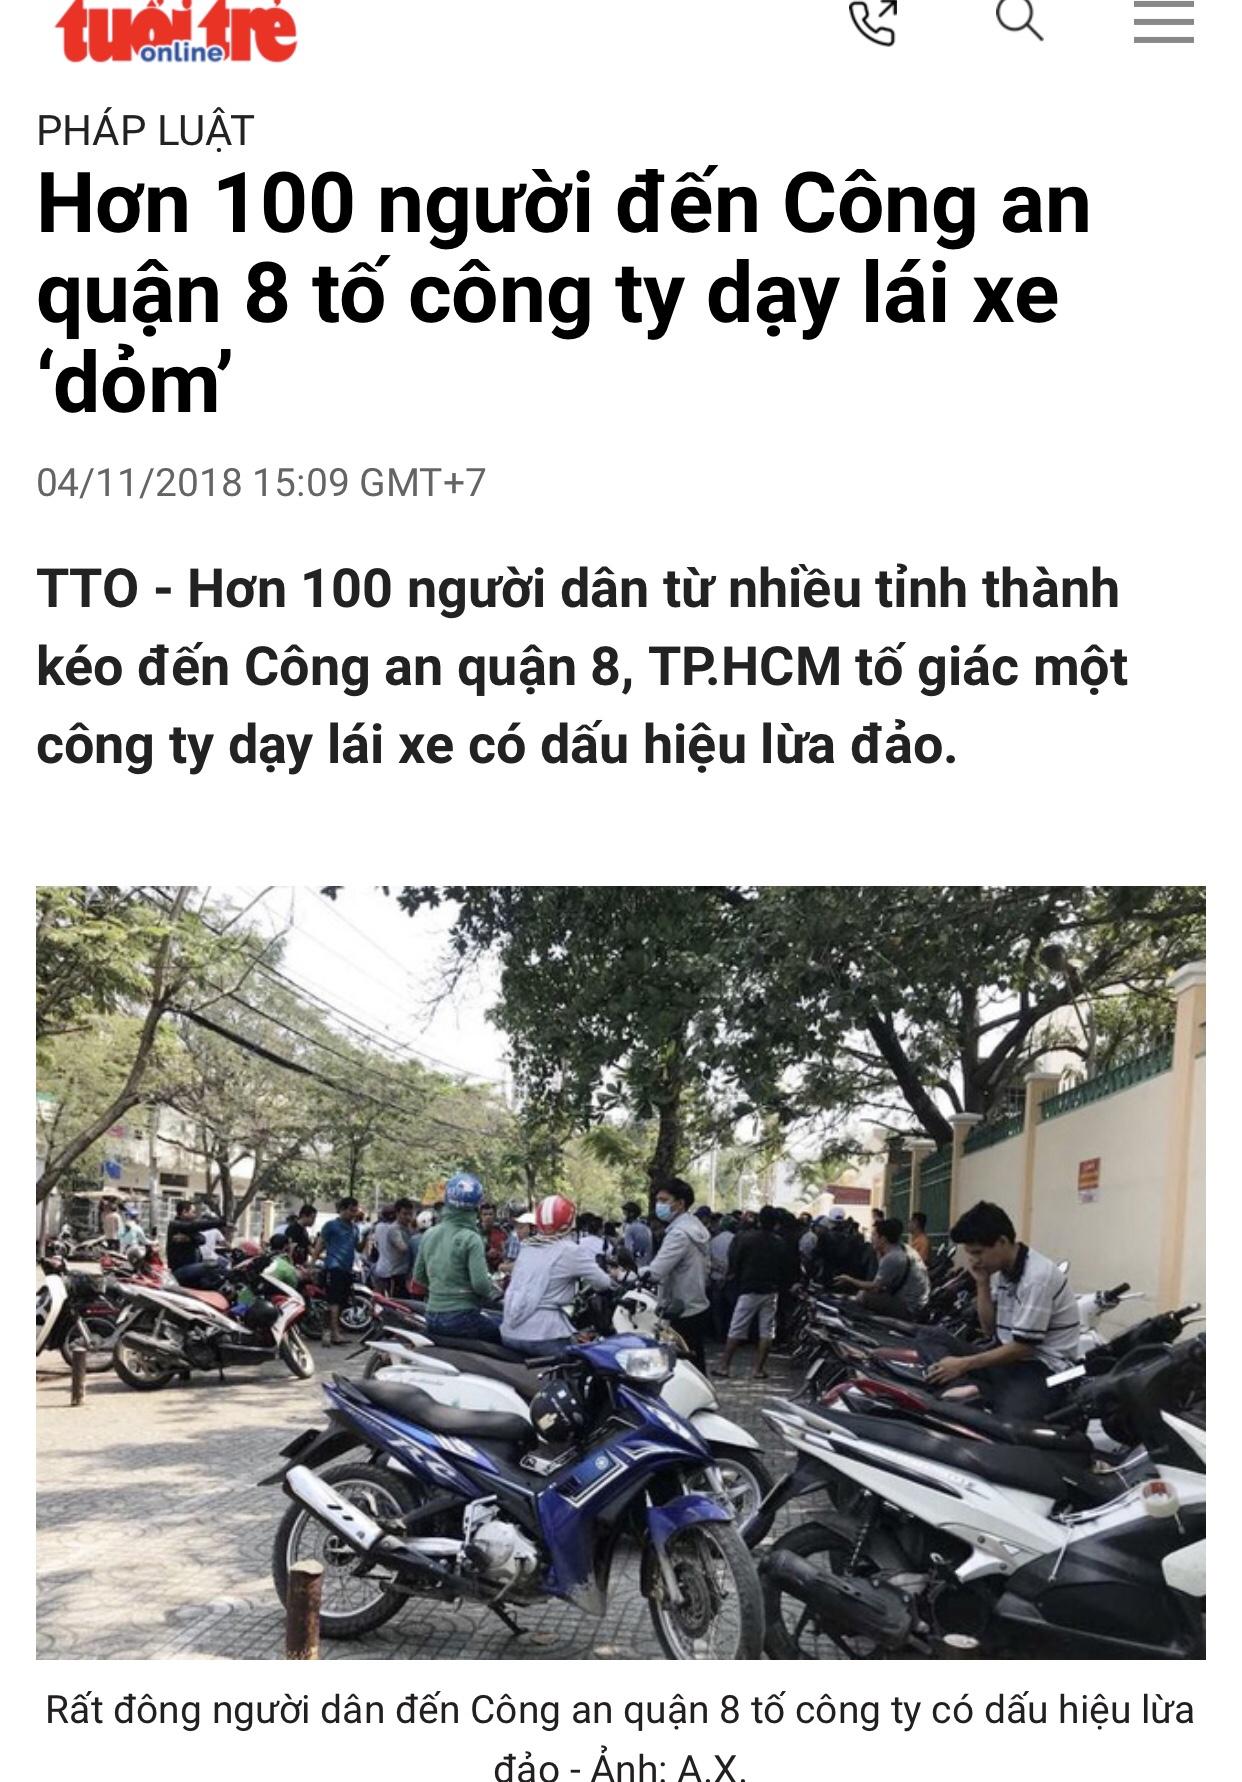 van_phong_dao_tao_lai_xe_lau_dao_tphcm